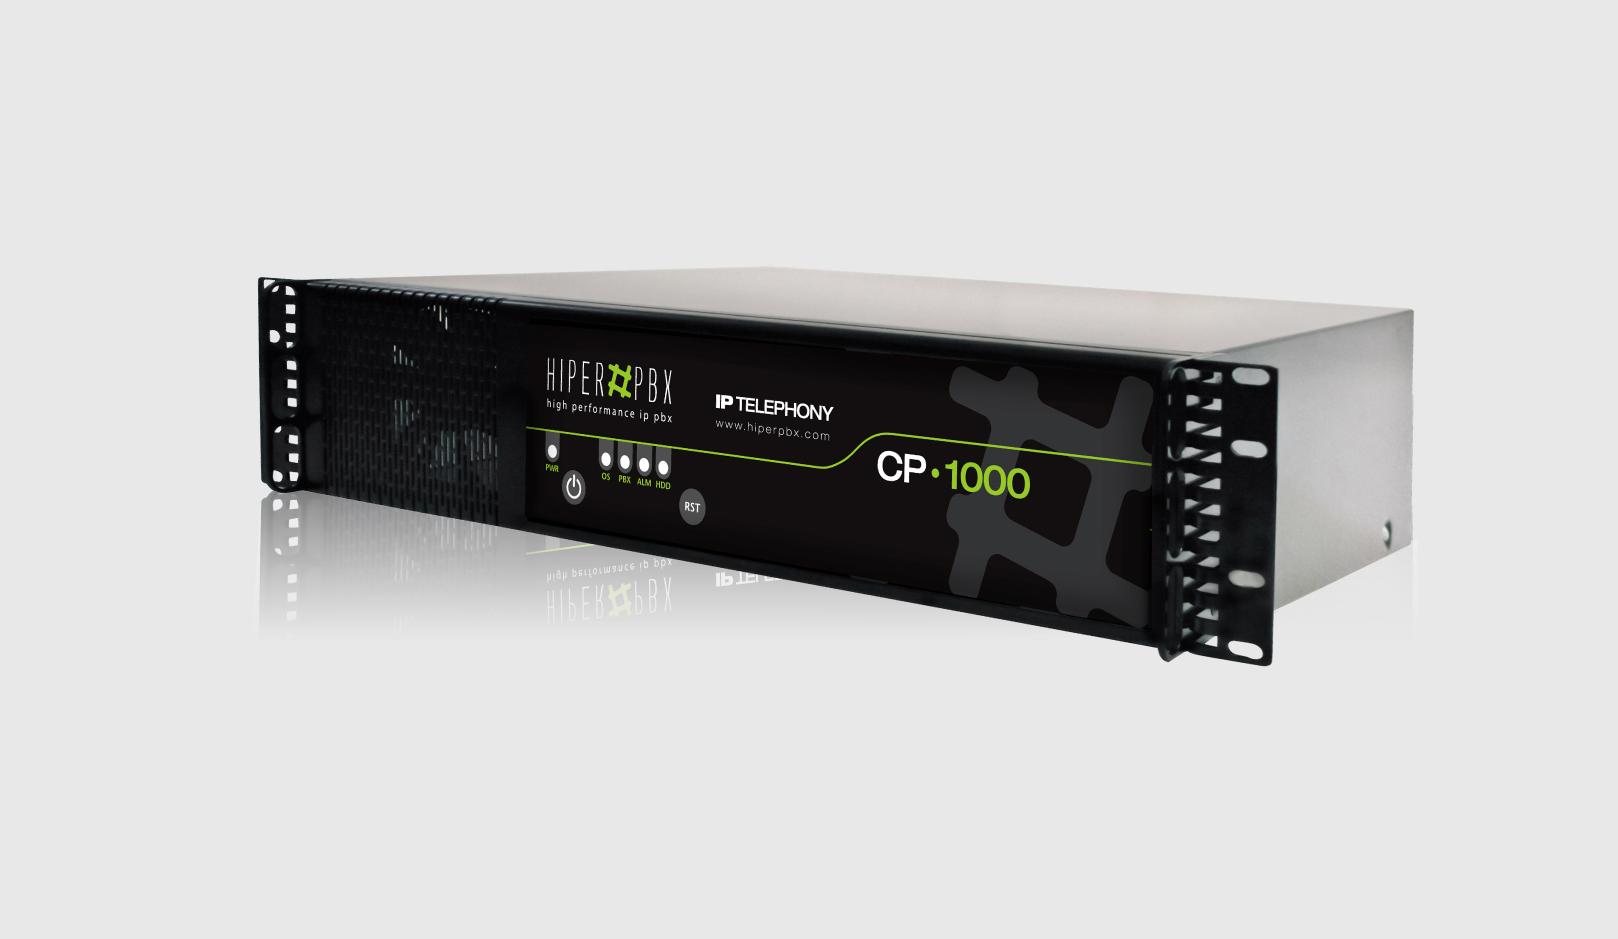 IP PBX CP-1000